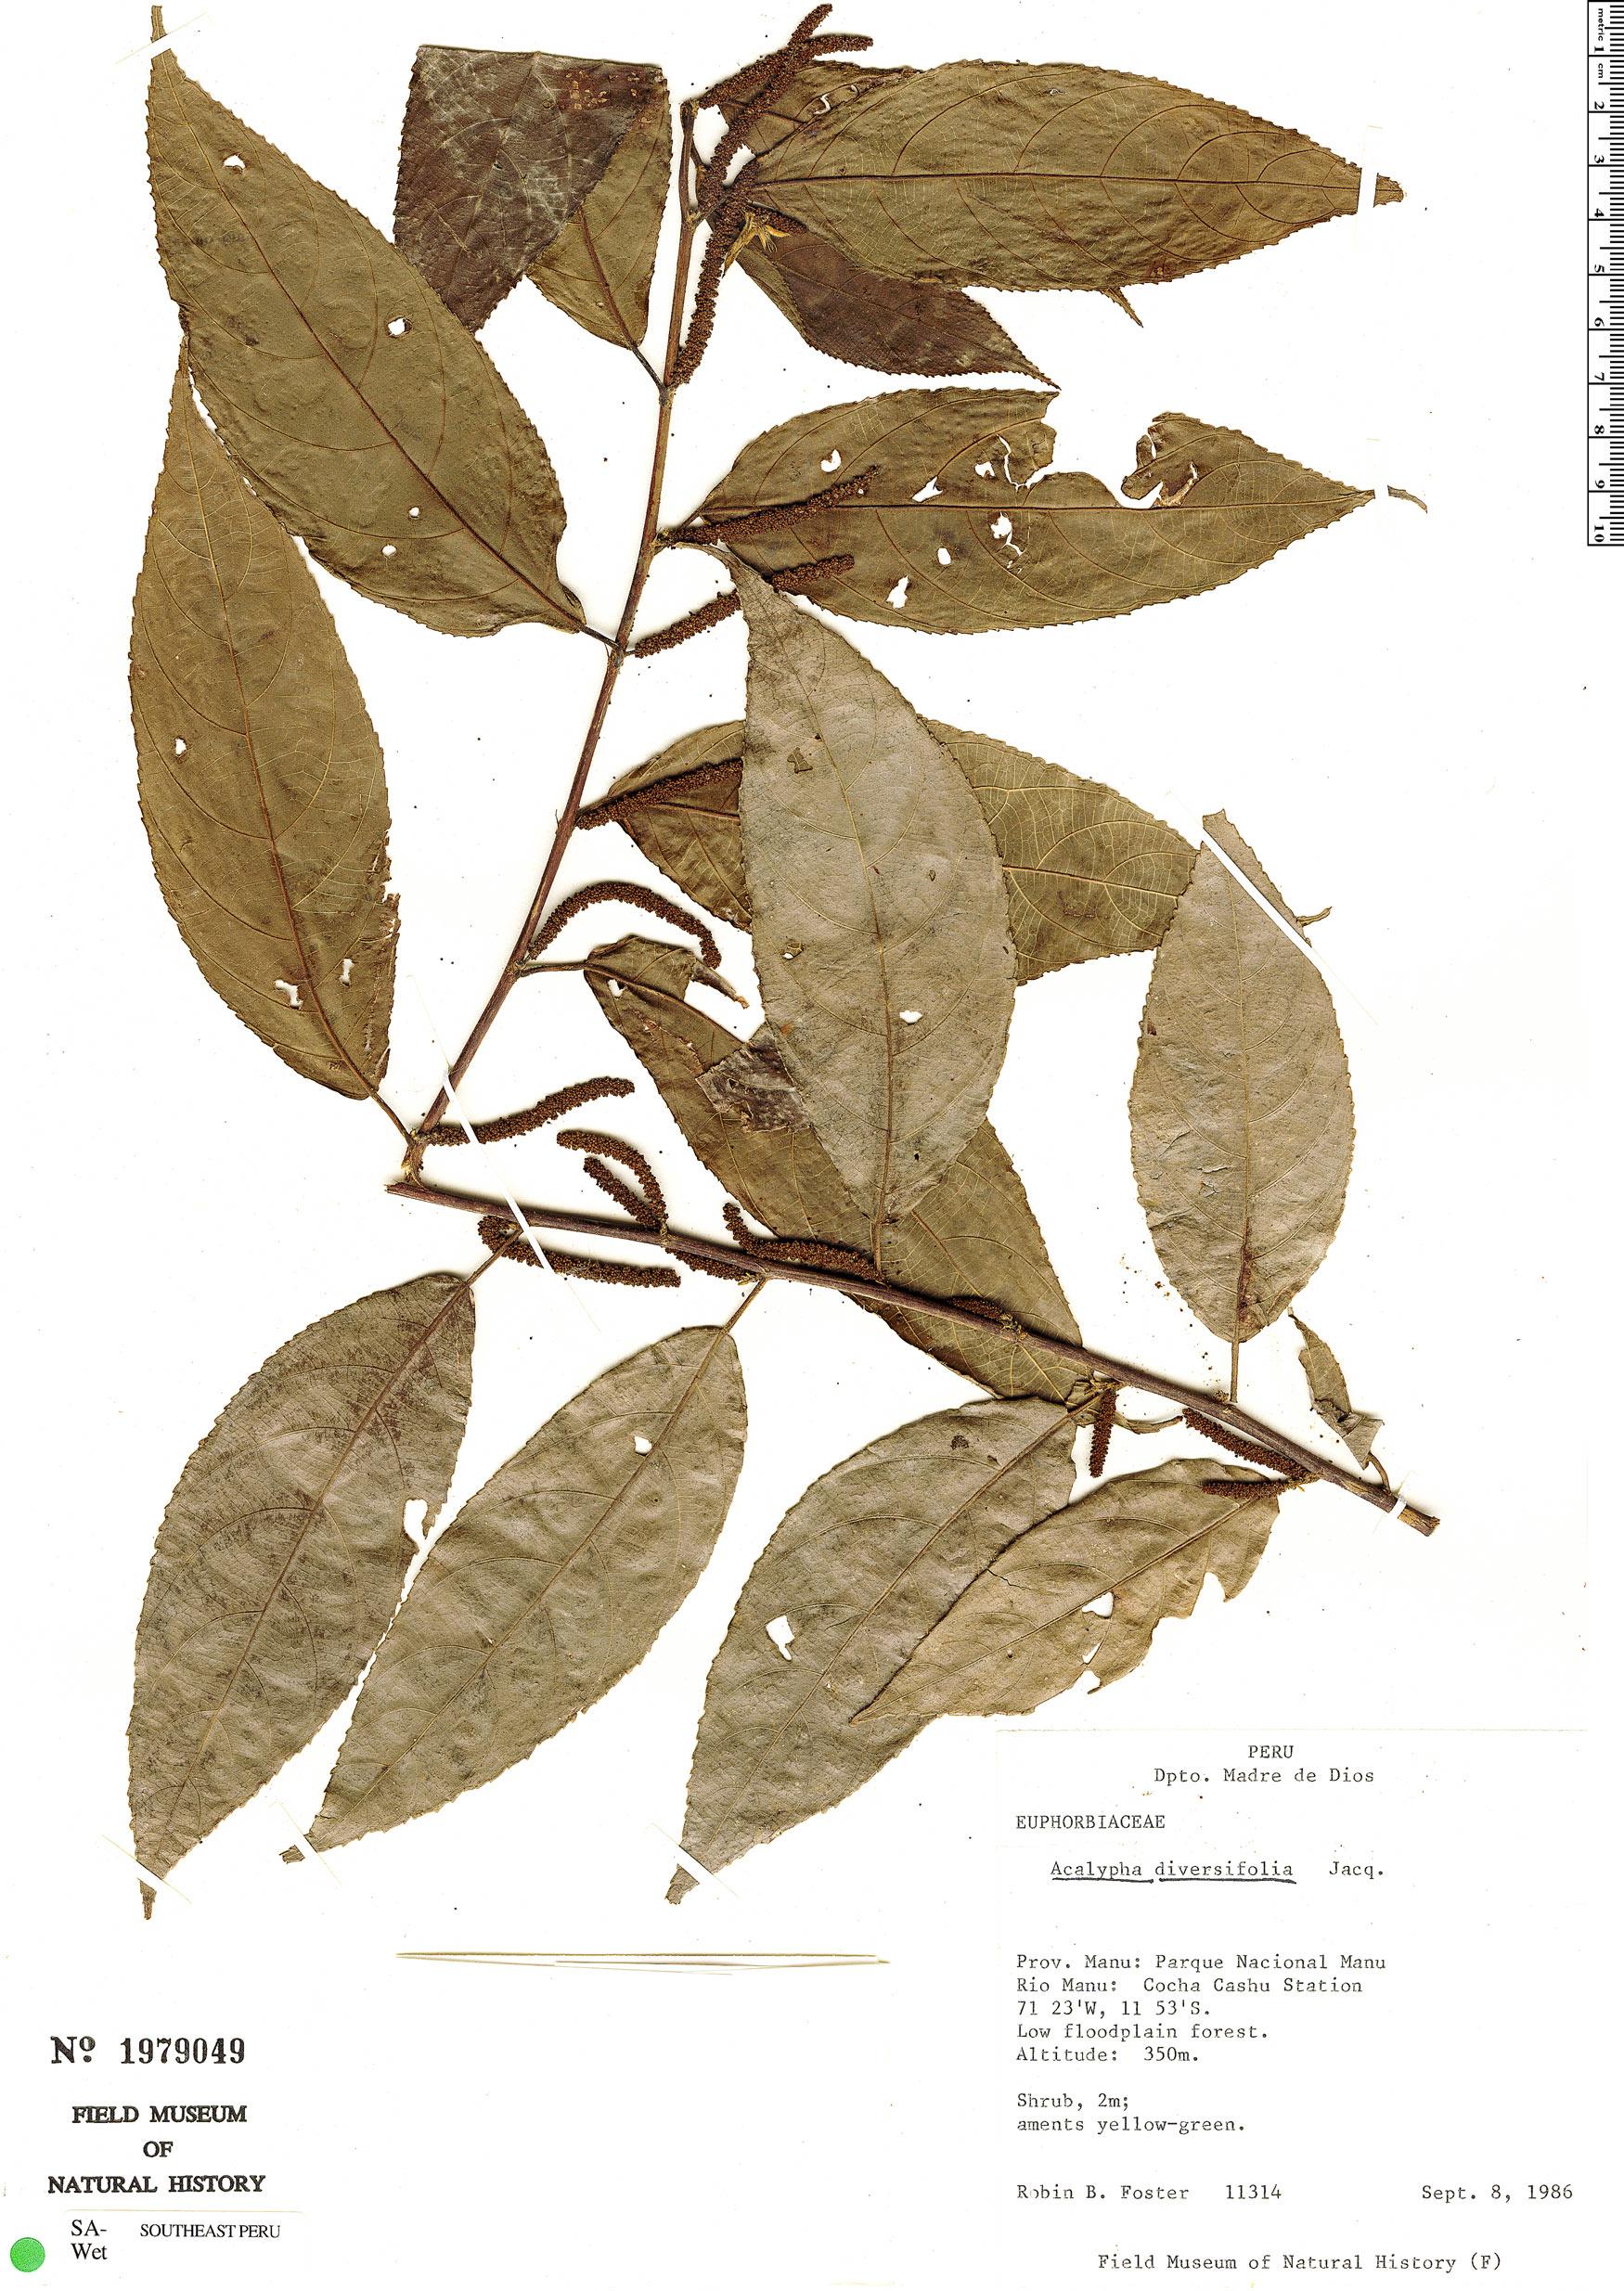 Espécime: Acalypha diversifolia